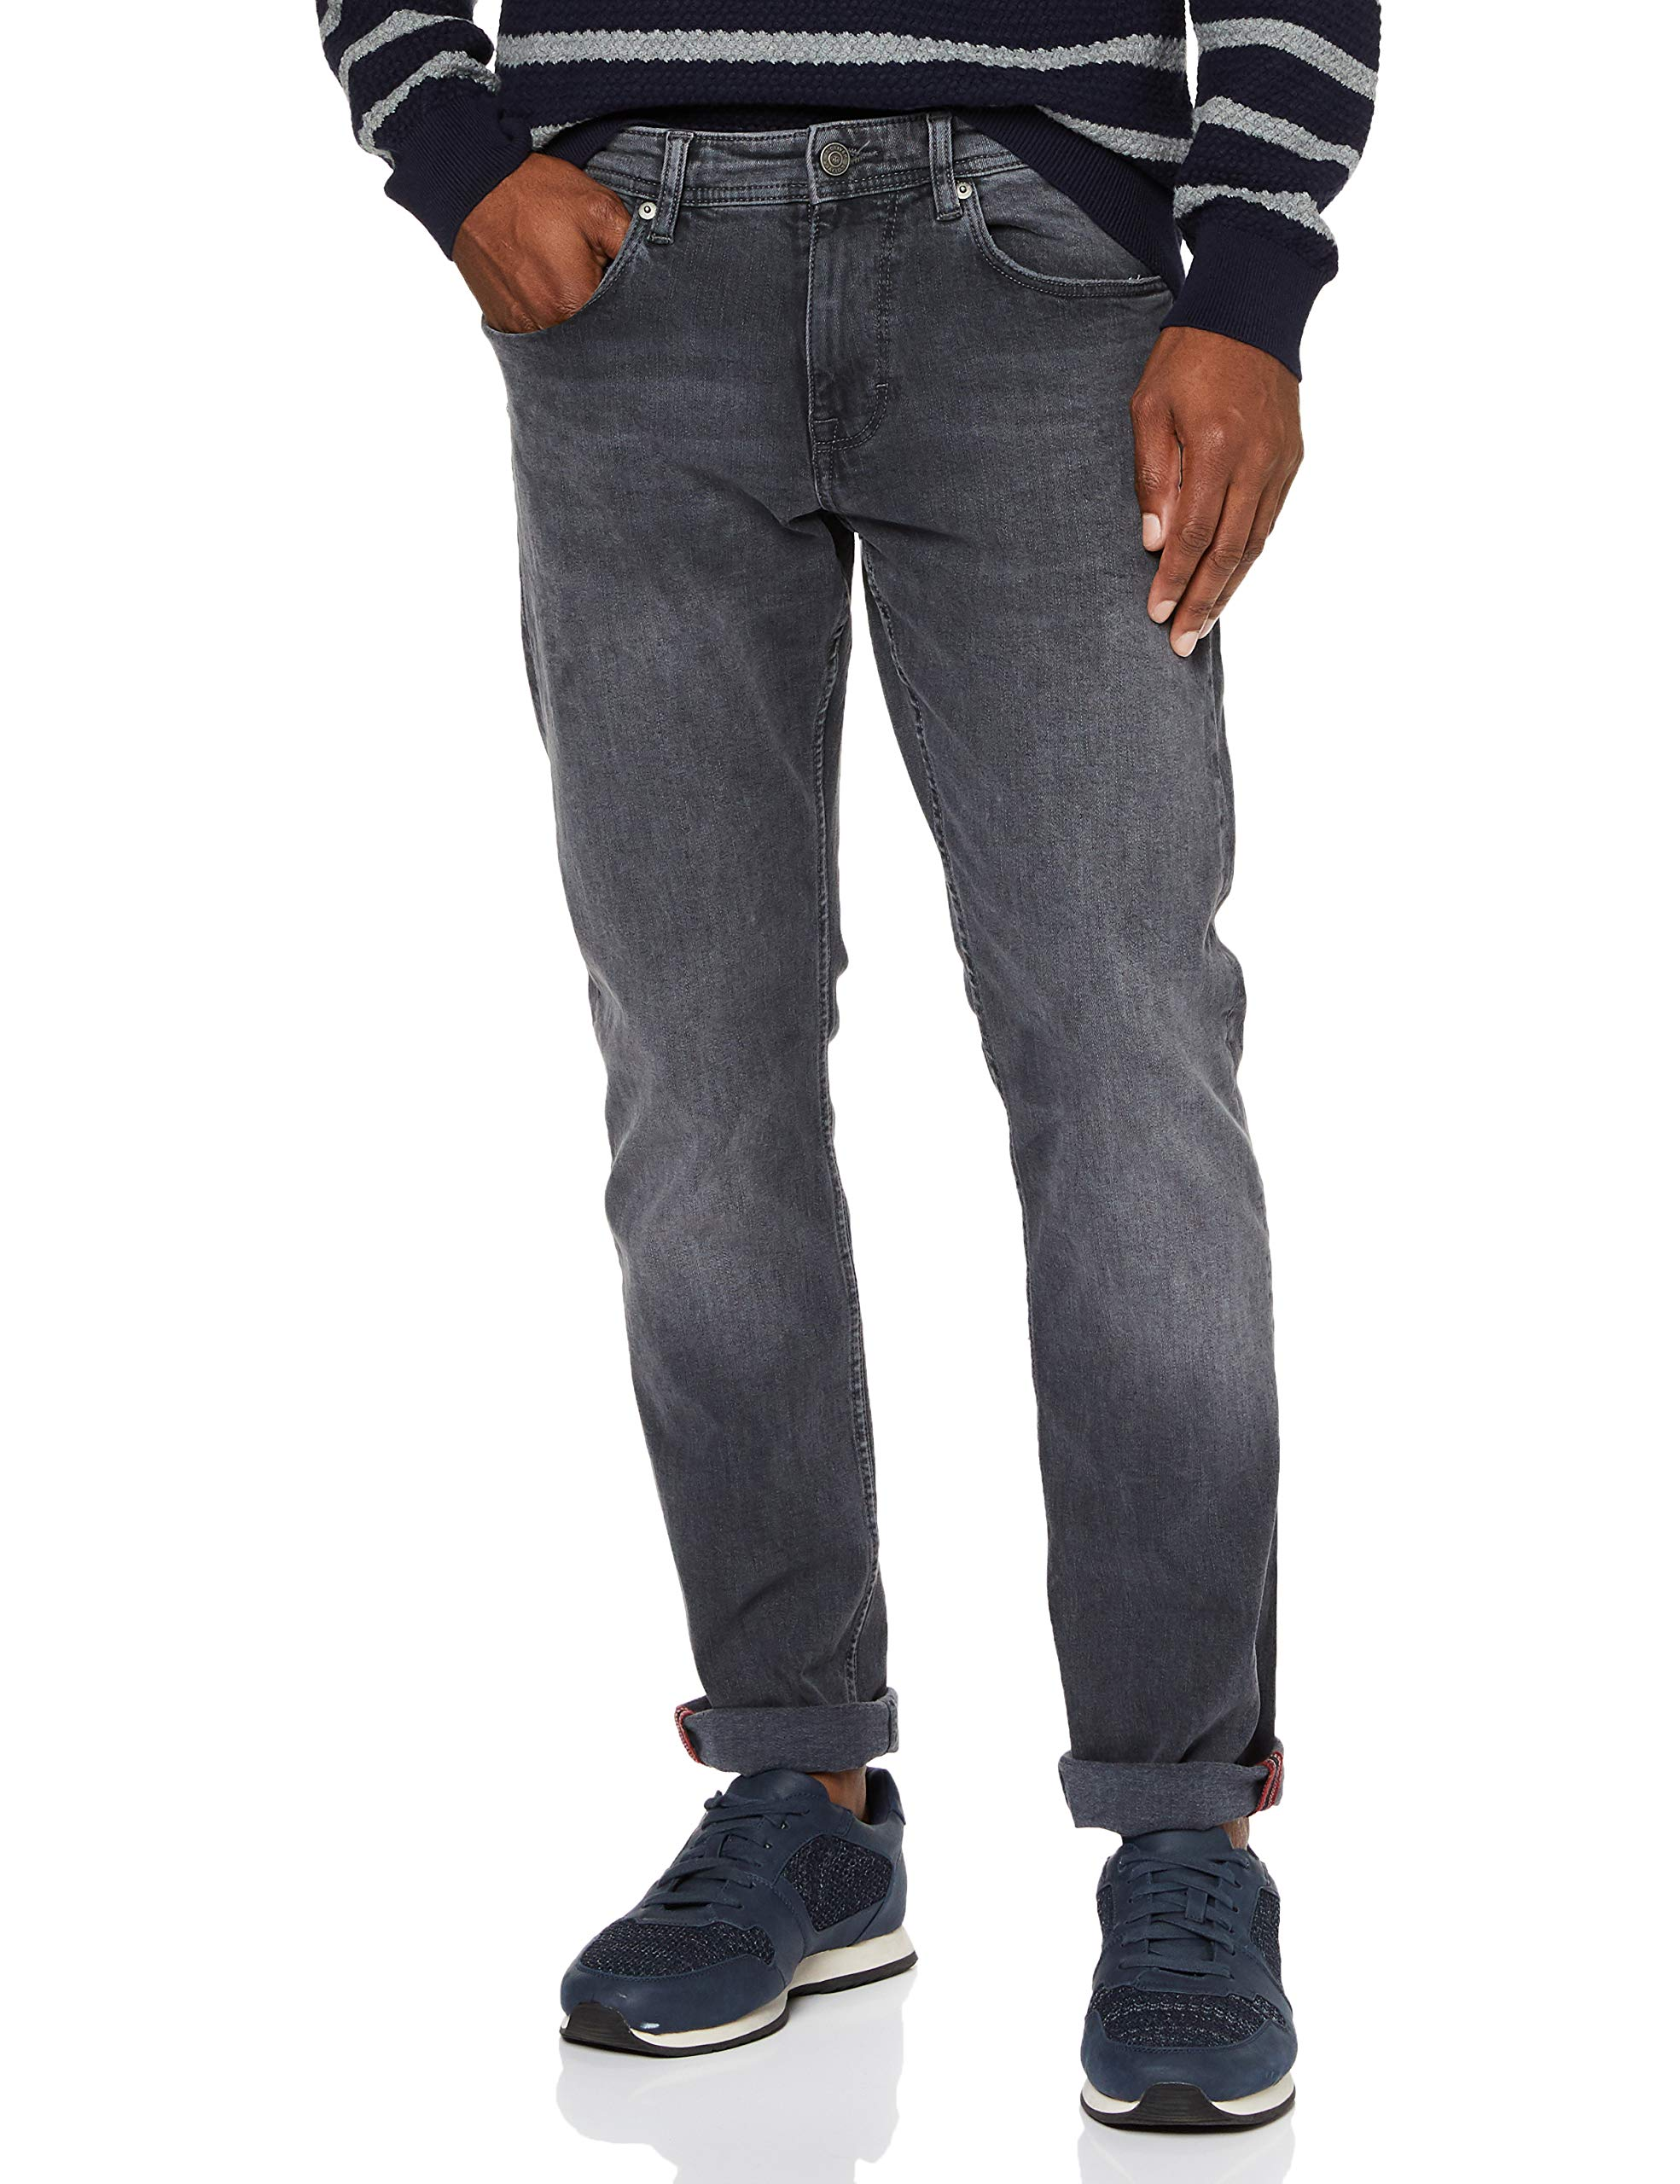 s.Oliver Herren 13.909.71.5702 Slim Jeans, Grau (GreyBlack Denim Stretch 95z4), W33 (Herstellergröße: 33)